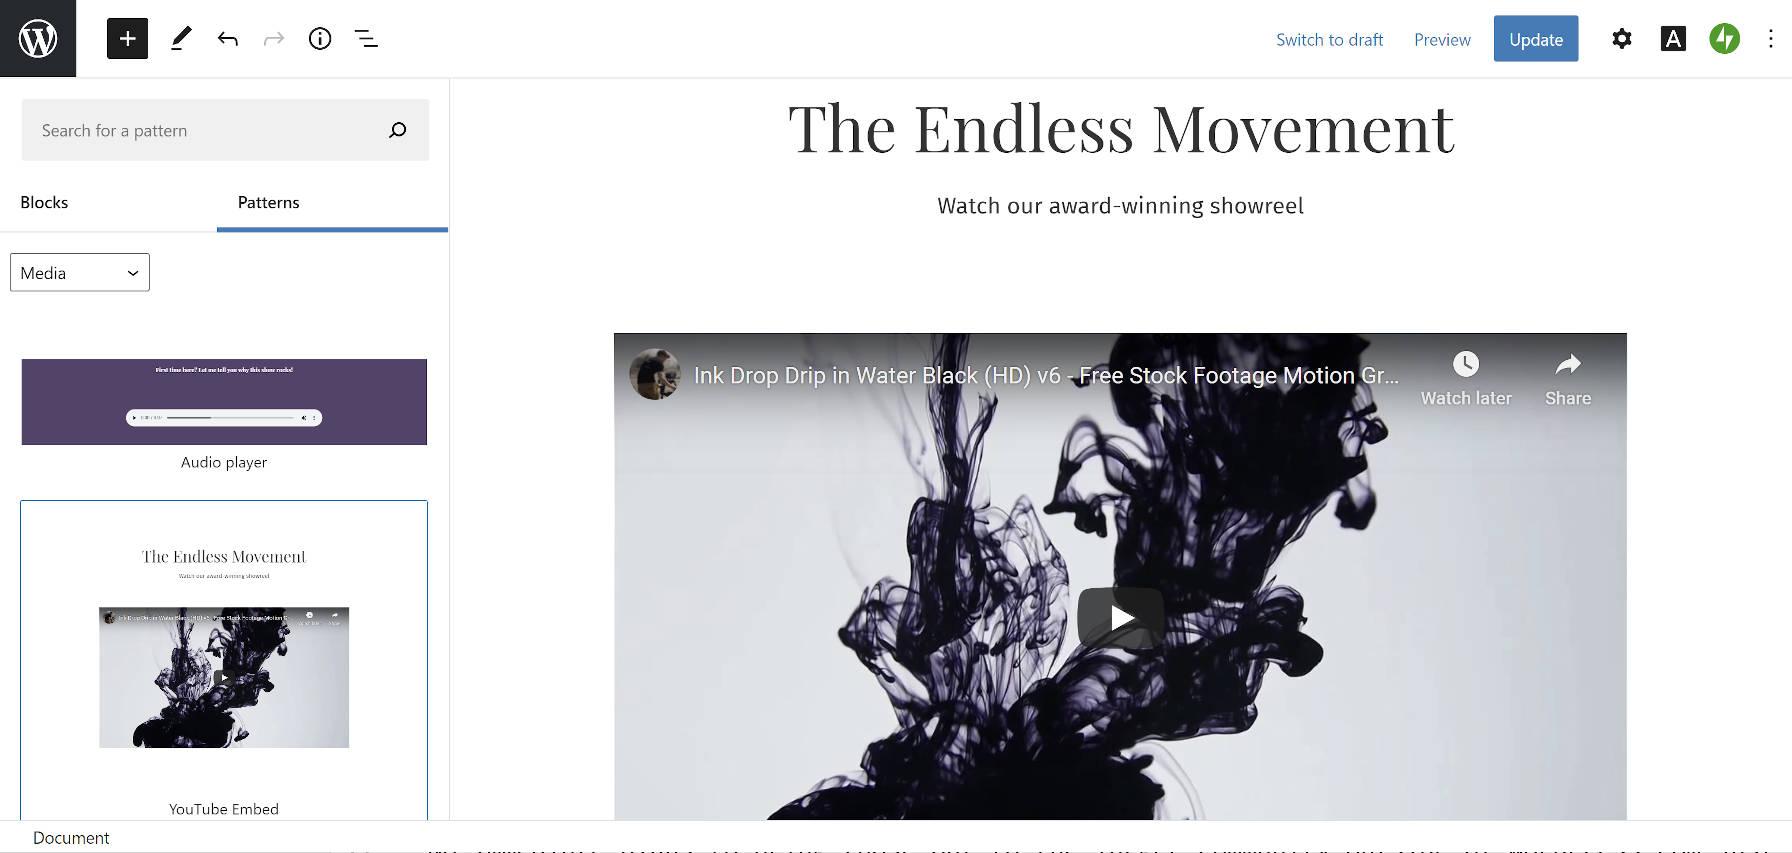 wpcom-patterns-yt-embed WordPress.com删除了100多种块模式,为设计社区应遵循的道路